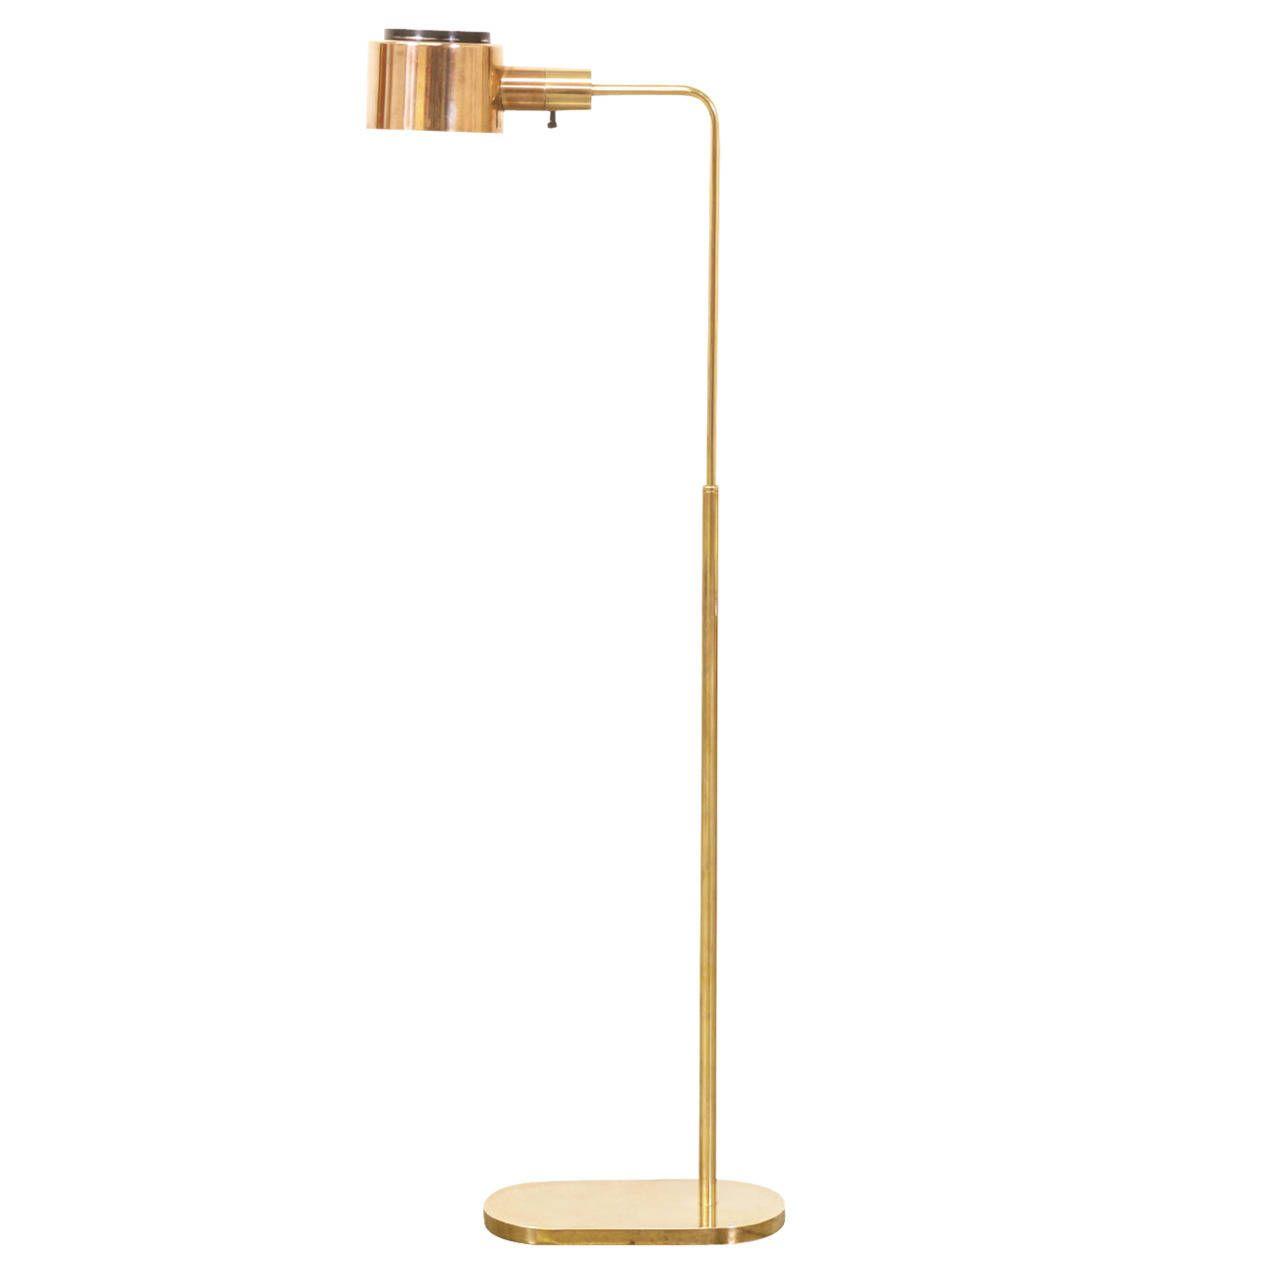 Casella Brass Reading Lamp Vintage Floor Lamp Lamp Floor Lamp